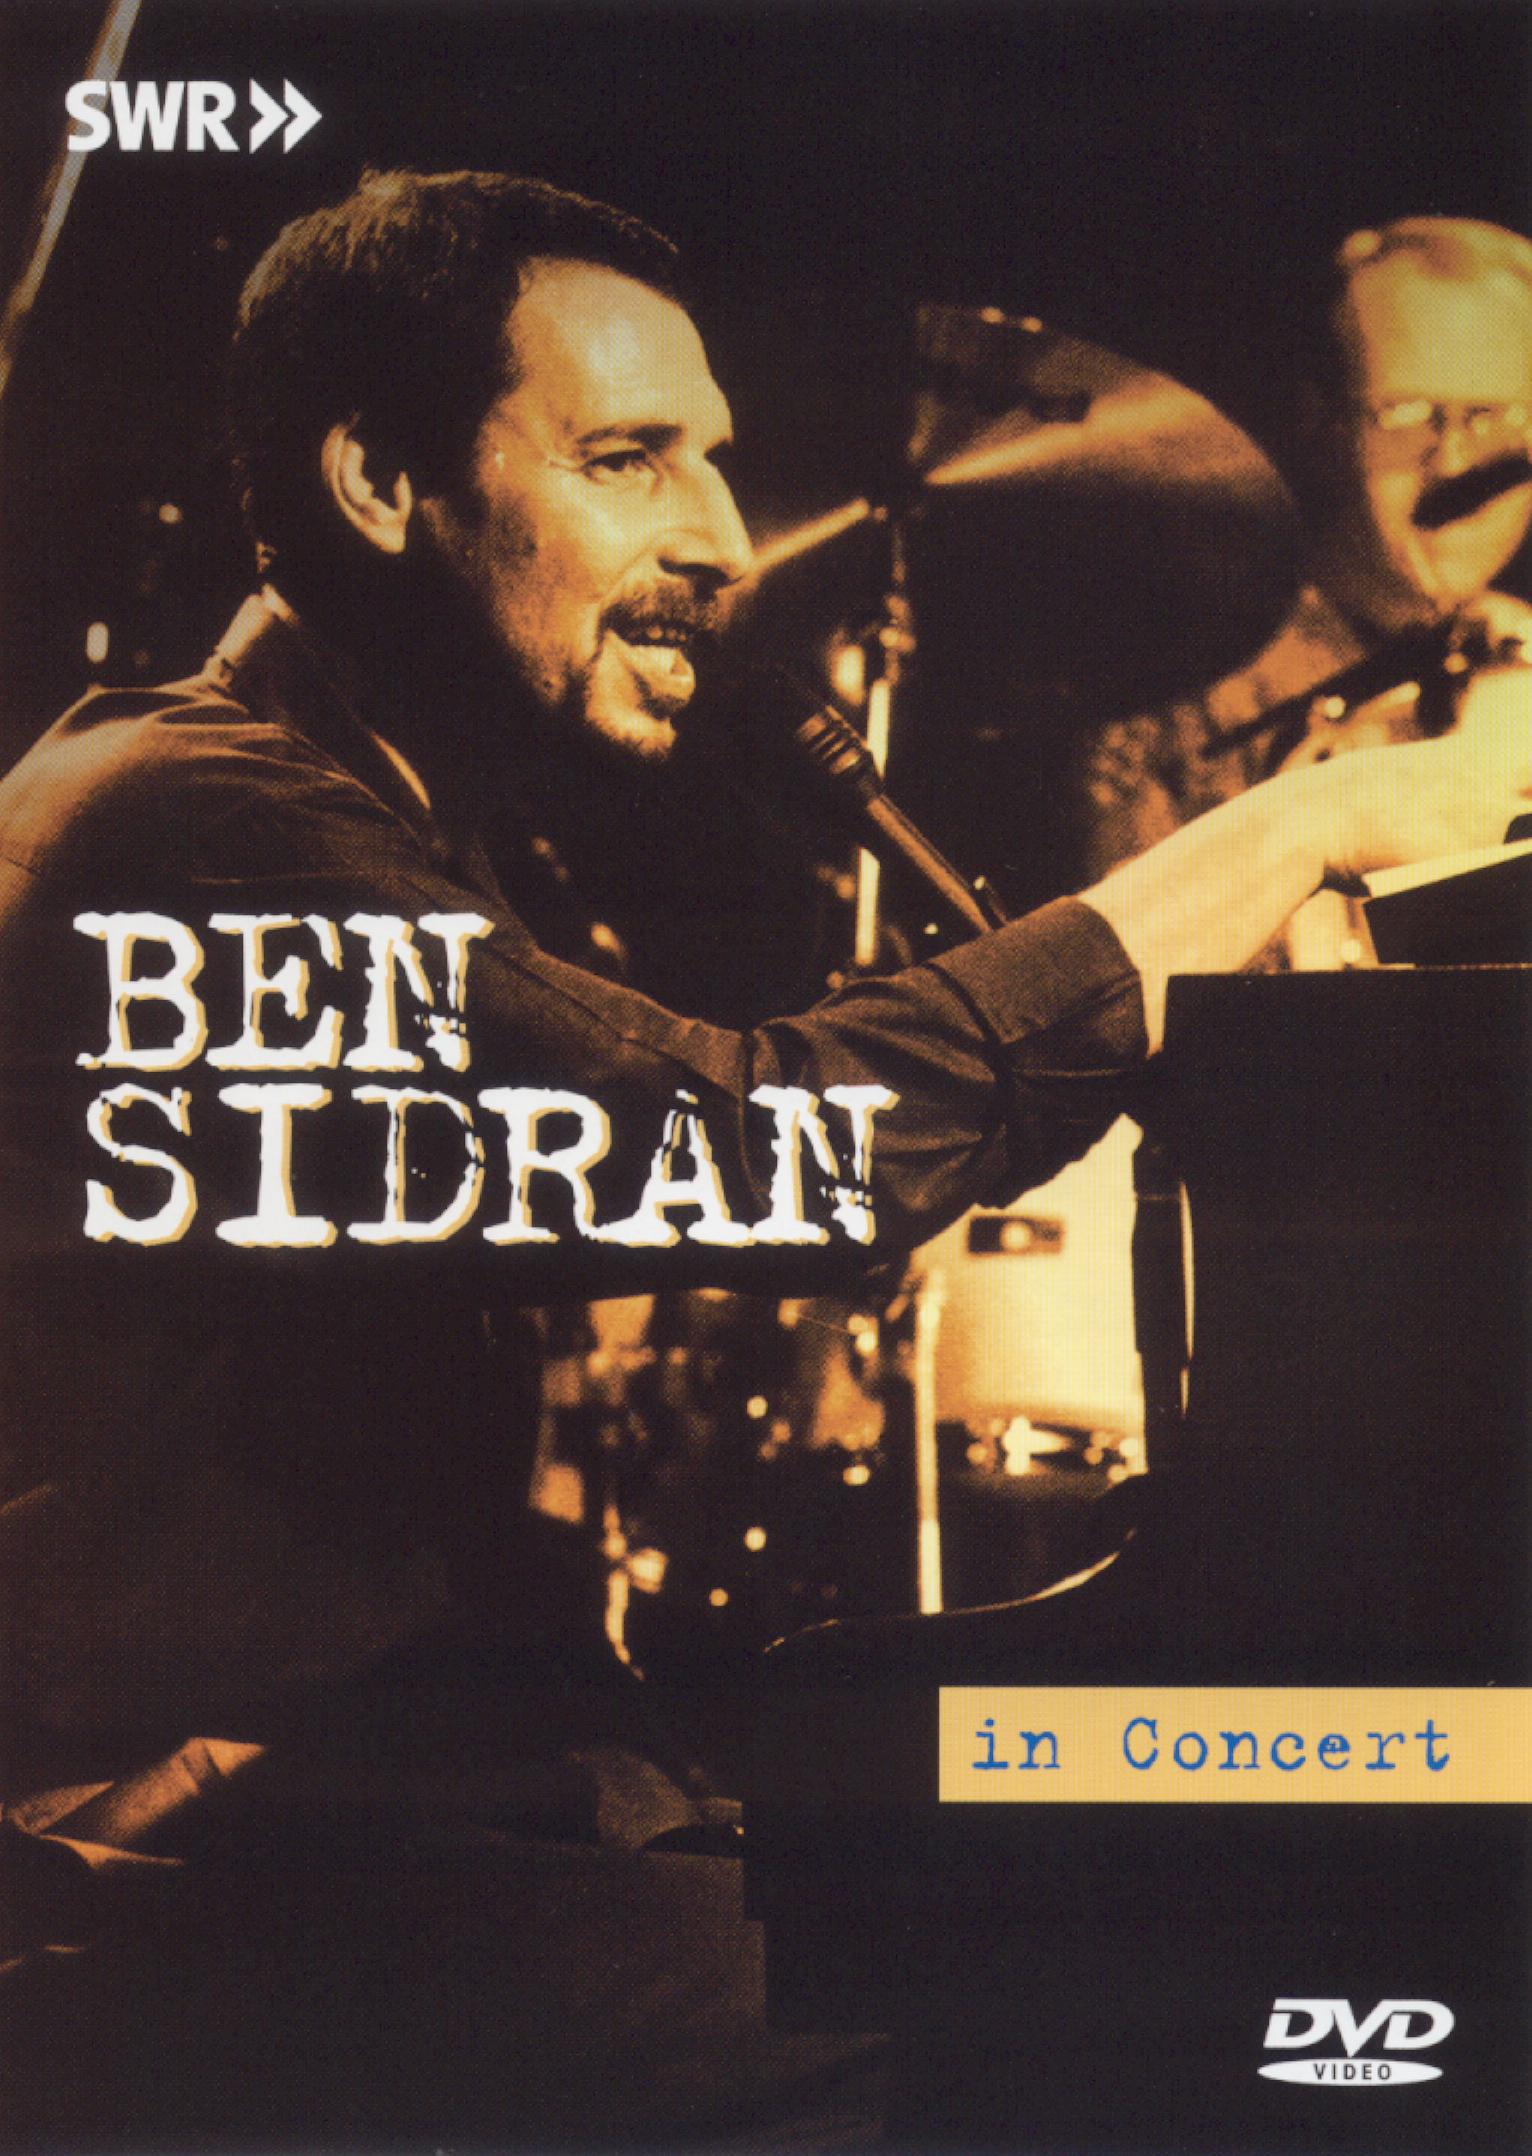 Ohne Filter - Musik Pur: Ben Sidran In Concert